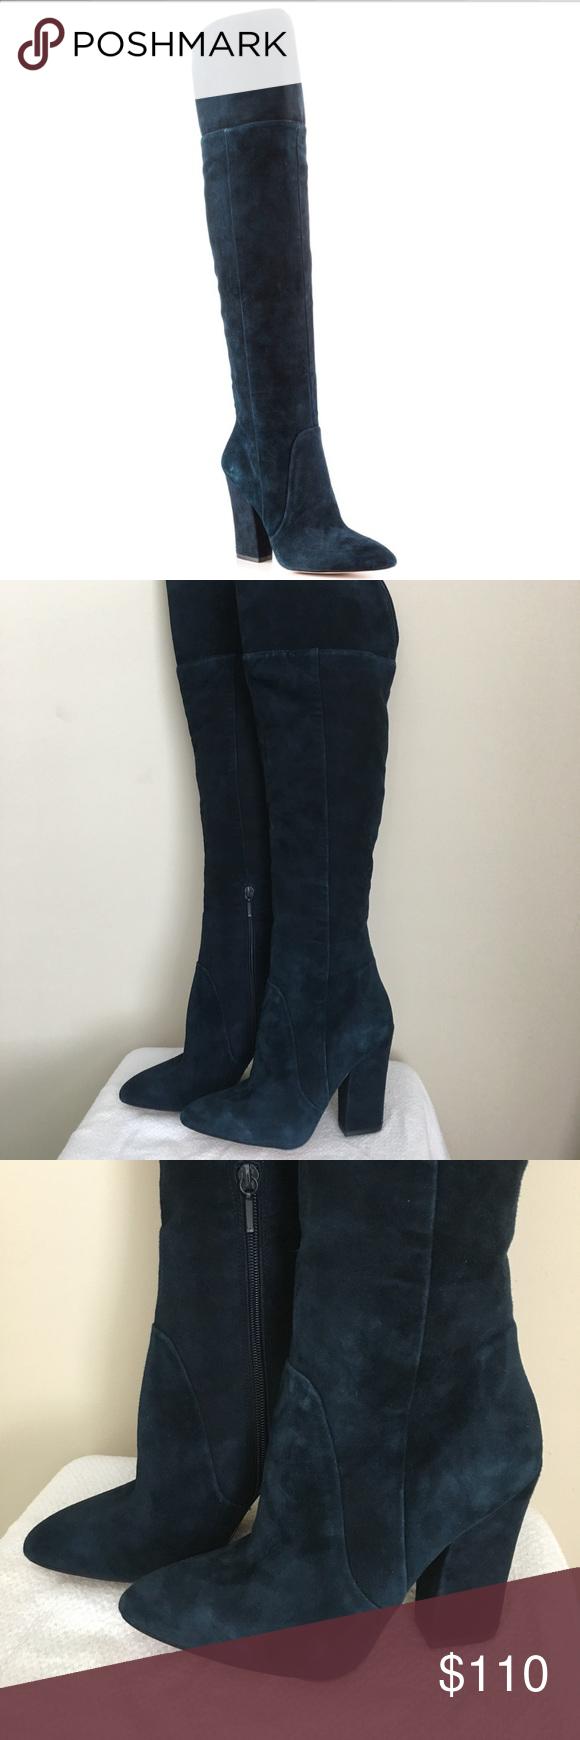 aldo shoes polish png backgrounds